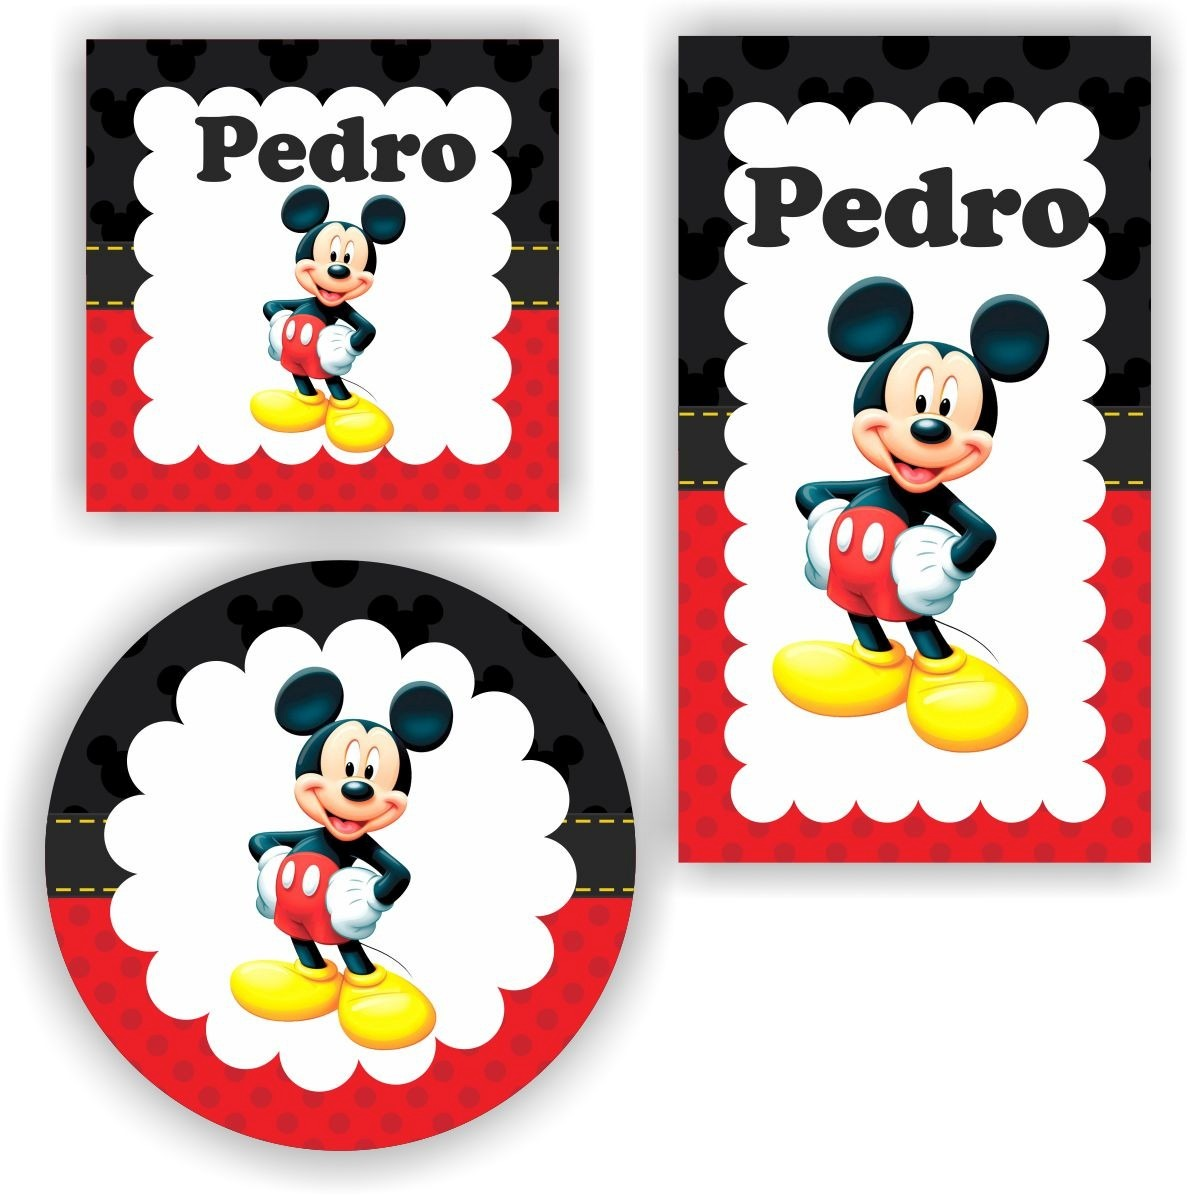 Adesivo De Parede Tijolo A Vista ~ Kit 120 Unid Adesivo Personalizado Mickey Minnie Lembrancinh R$ 29,99 em Mercado Livre